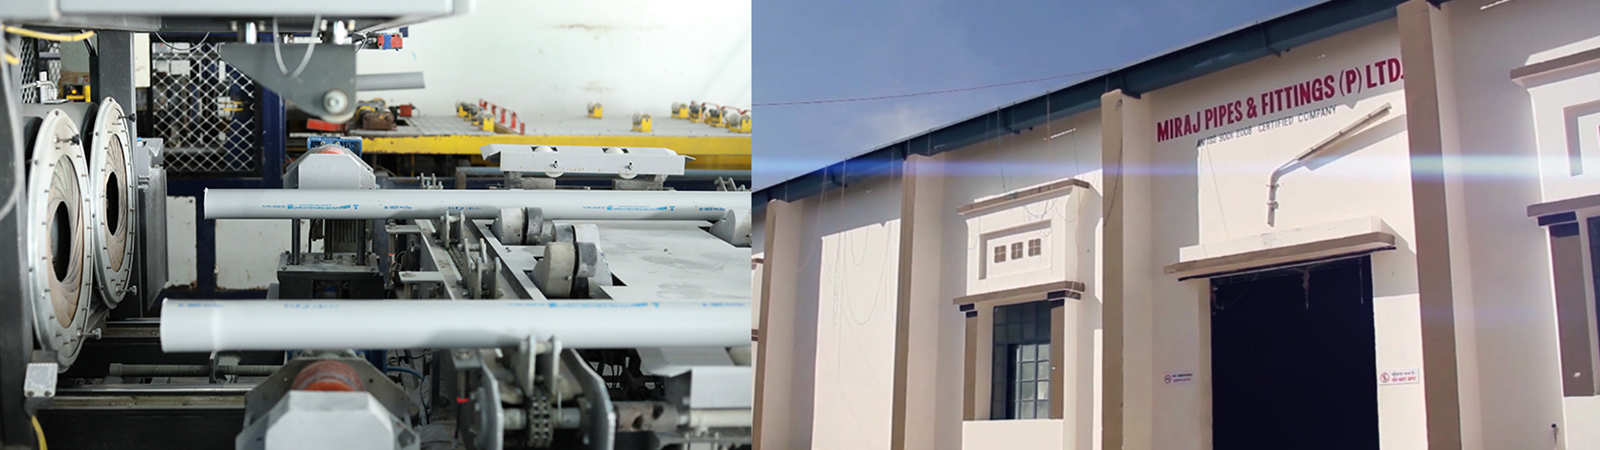 High Quality PVC, CPVC, UPVC, Column Pipes and Fittings